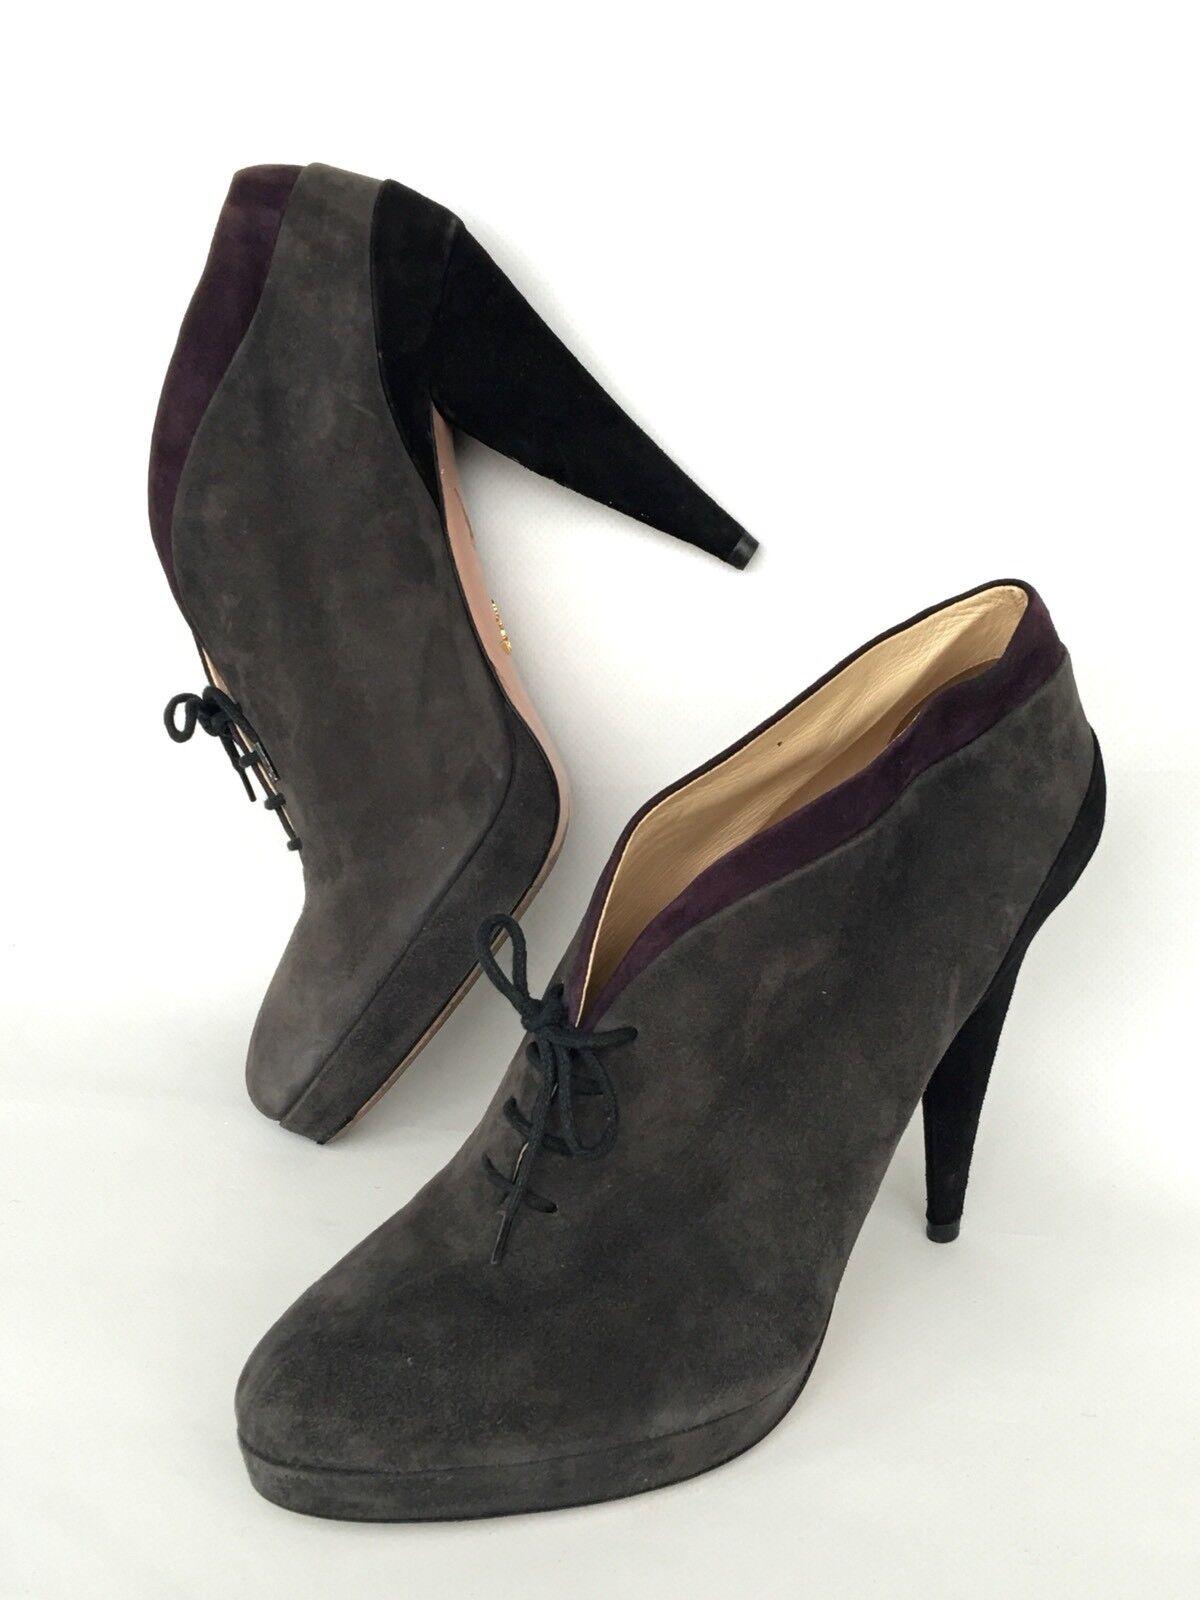 Prada Schuhes High Heels Suede Lace-up US 9, EU 40